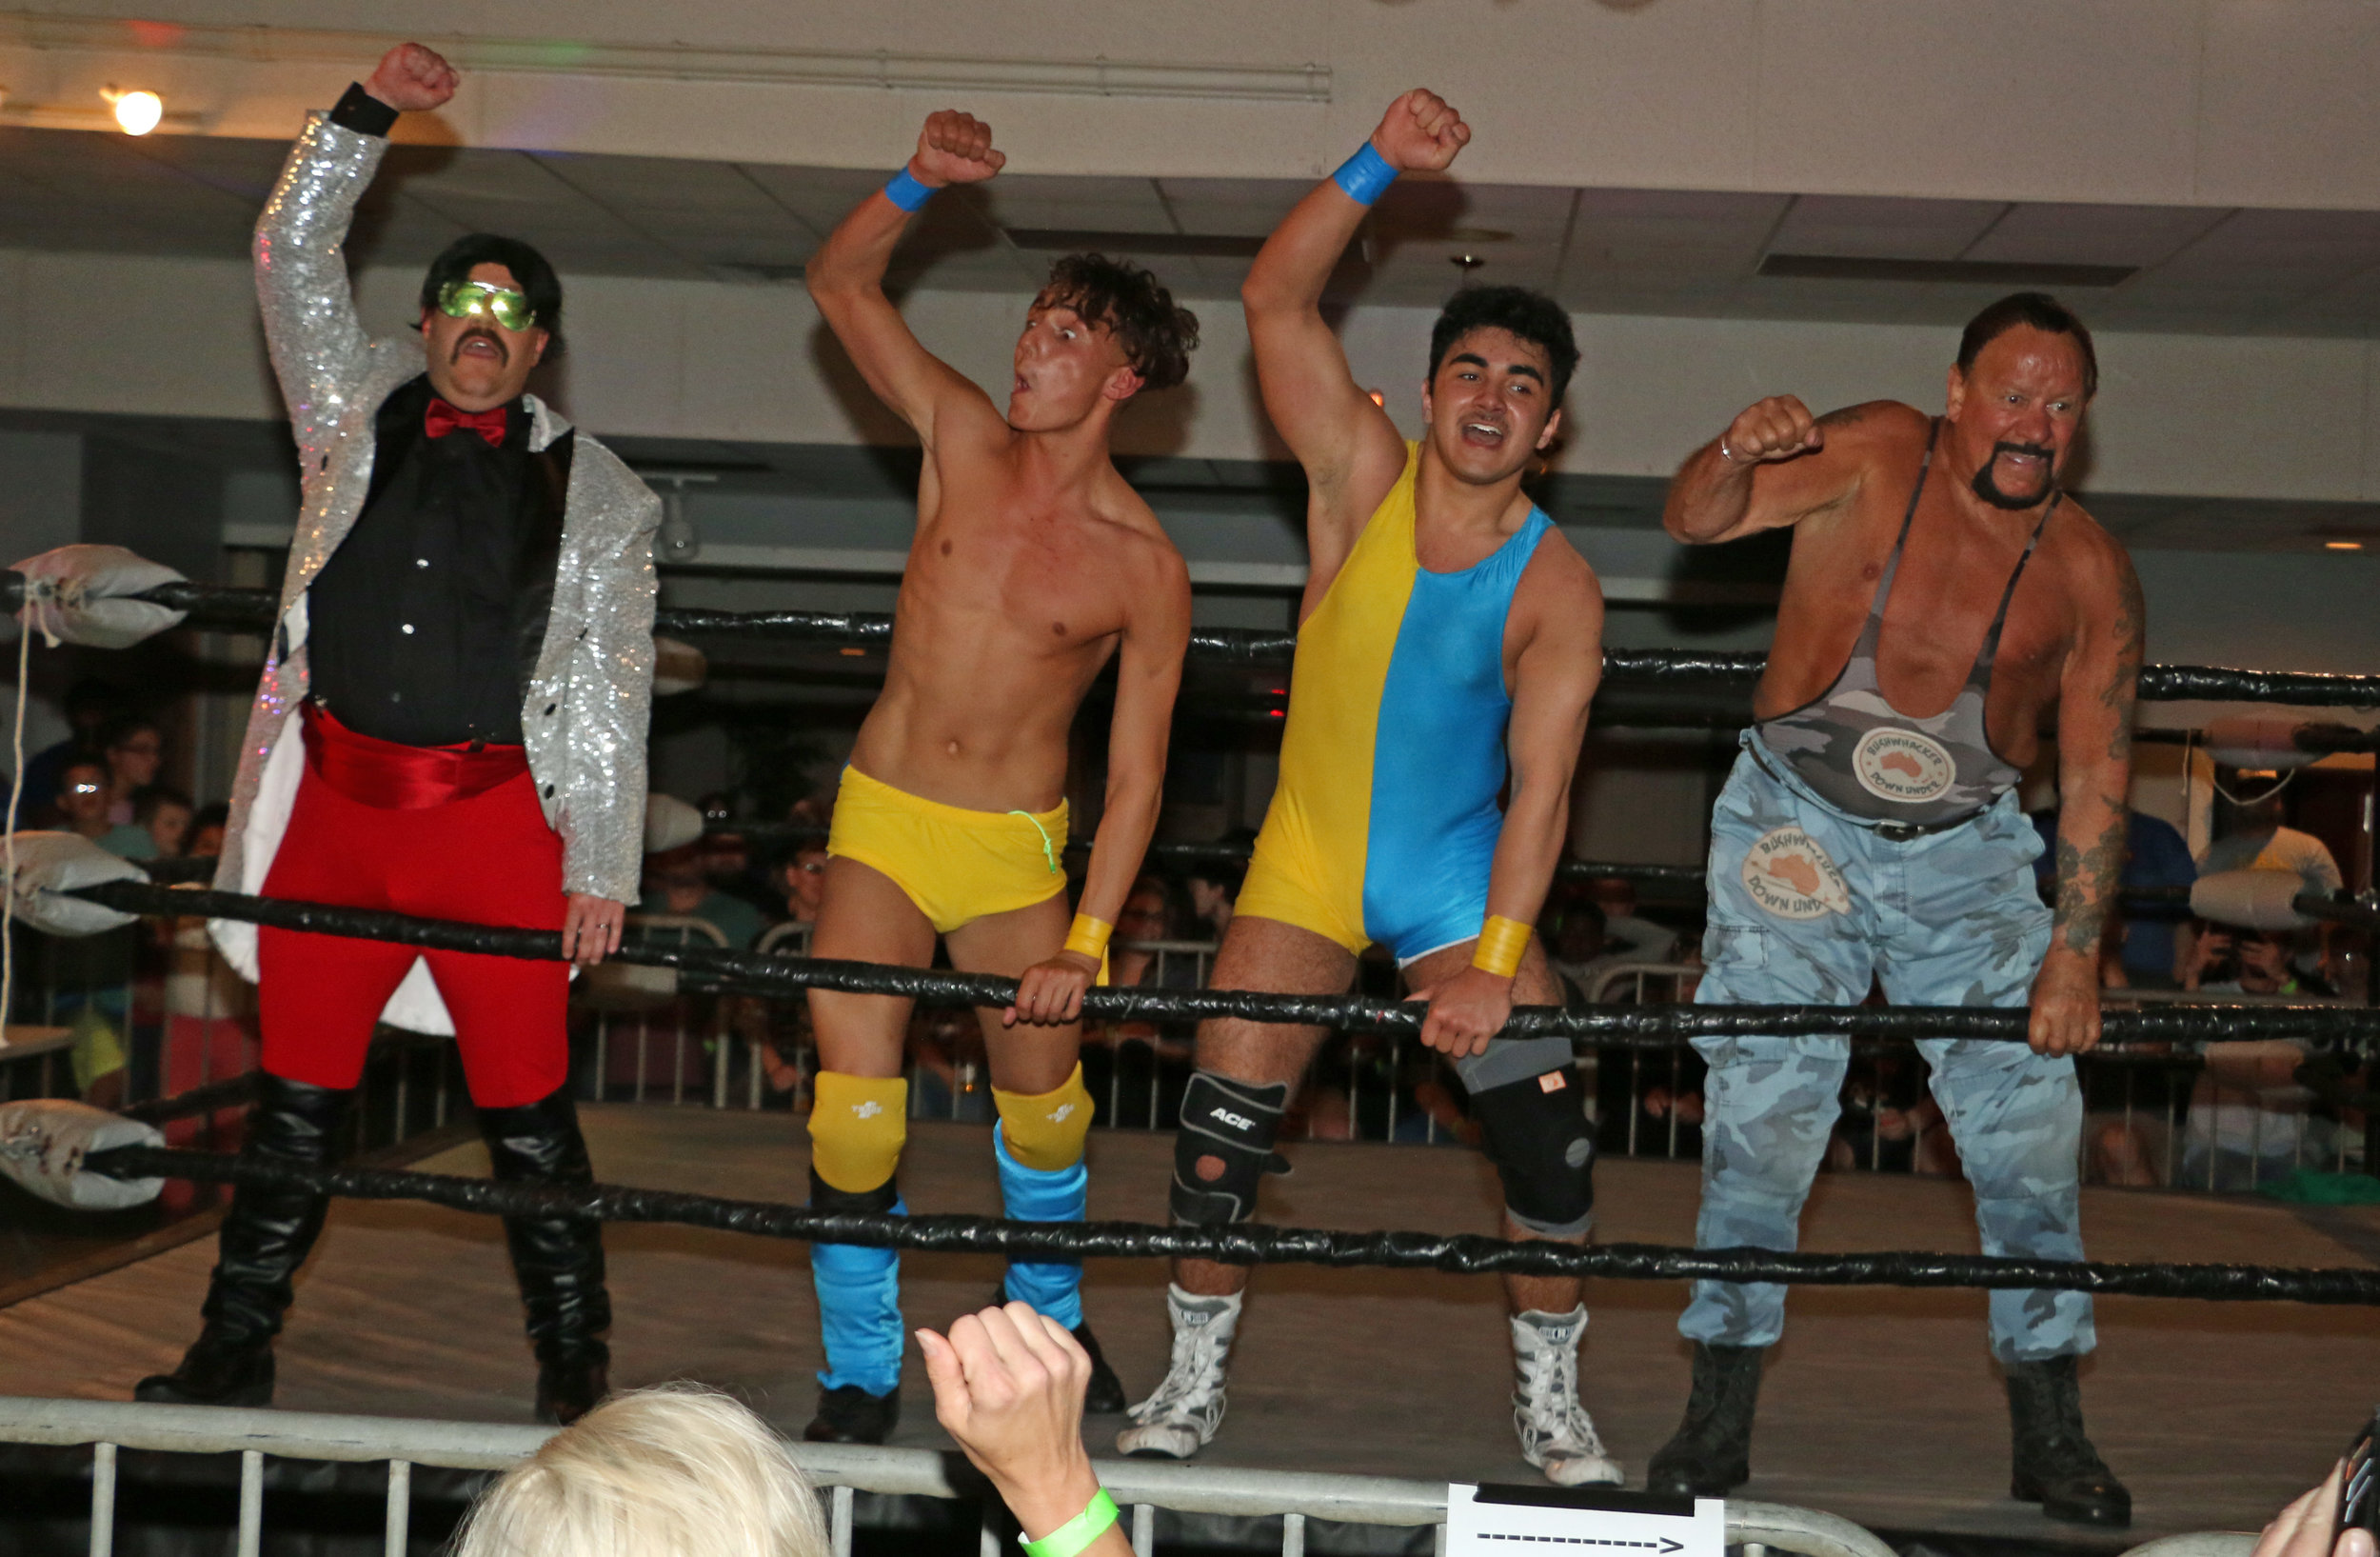 A bushwhacking good time: Sidney Bakabella, from left, Jordan Kross, Kal Herro and Bushwhacker Luke celebrate victory.